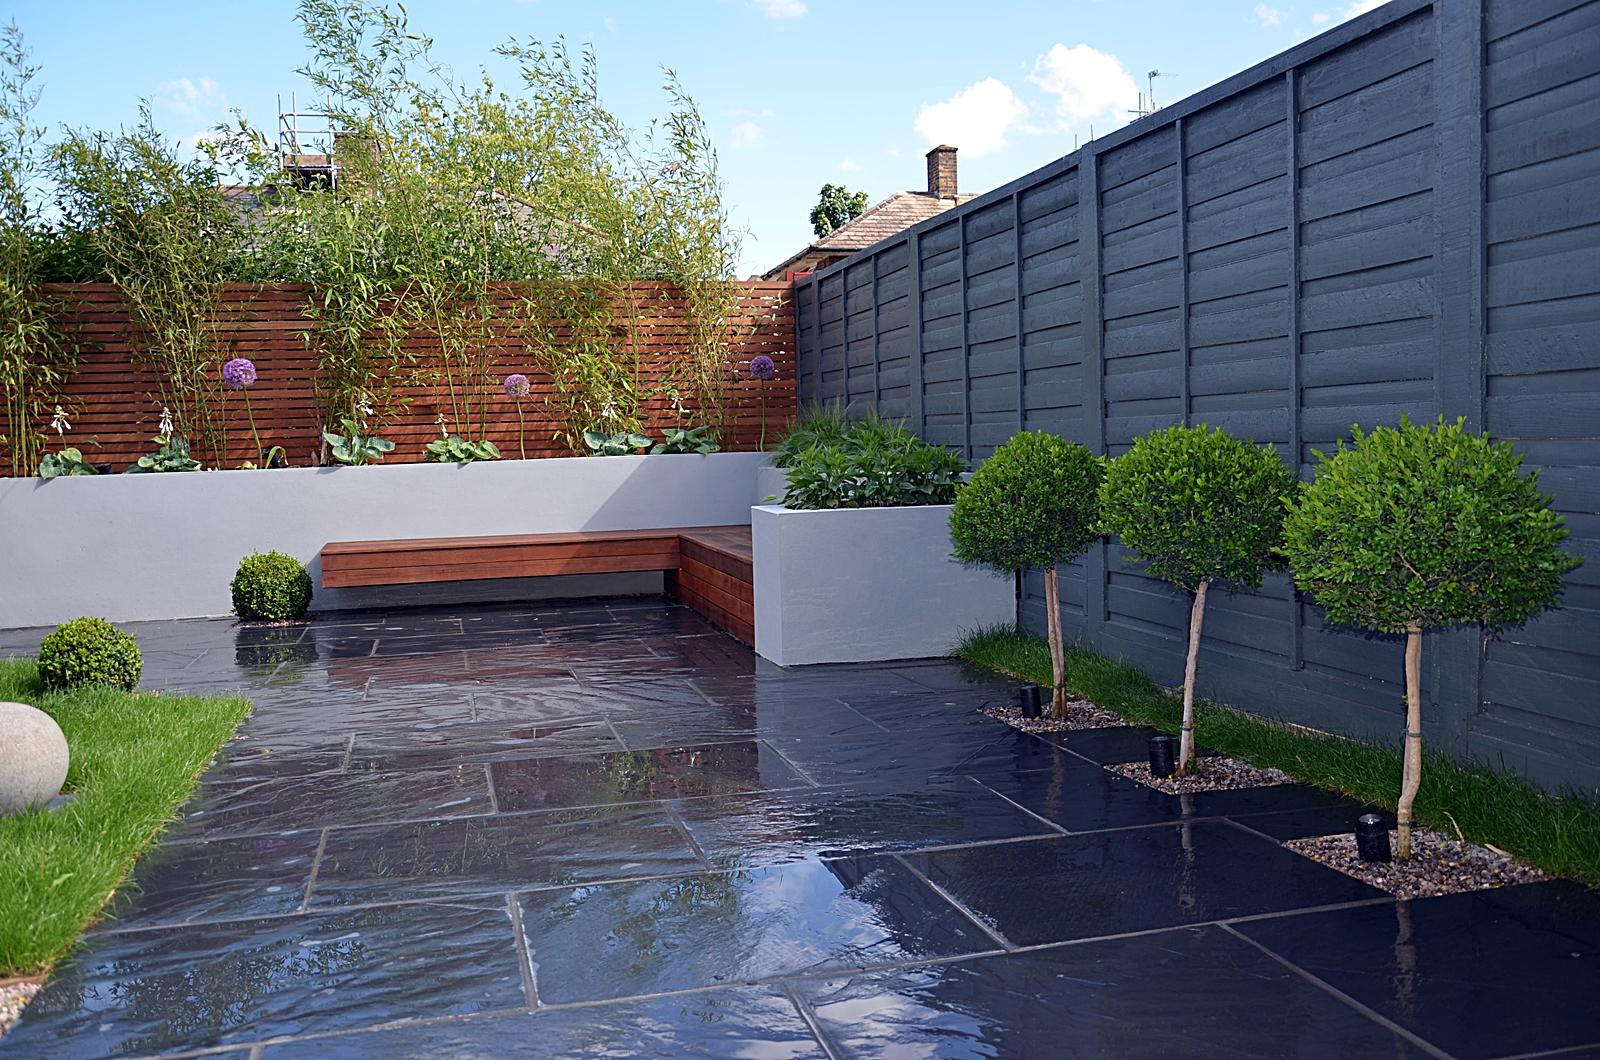 garden ideas 2014 uk - Garden Ideas 2014 Uk